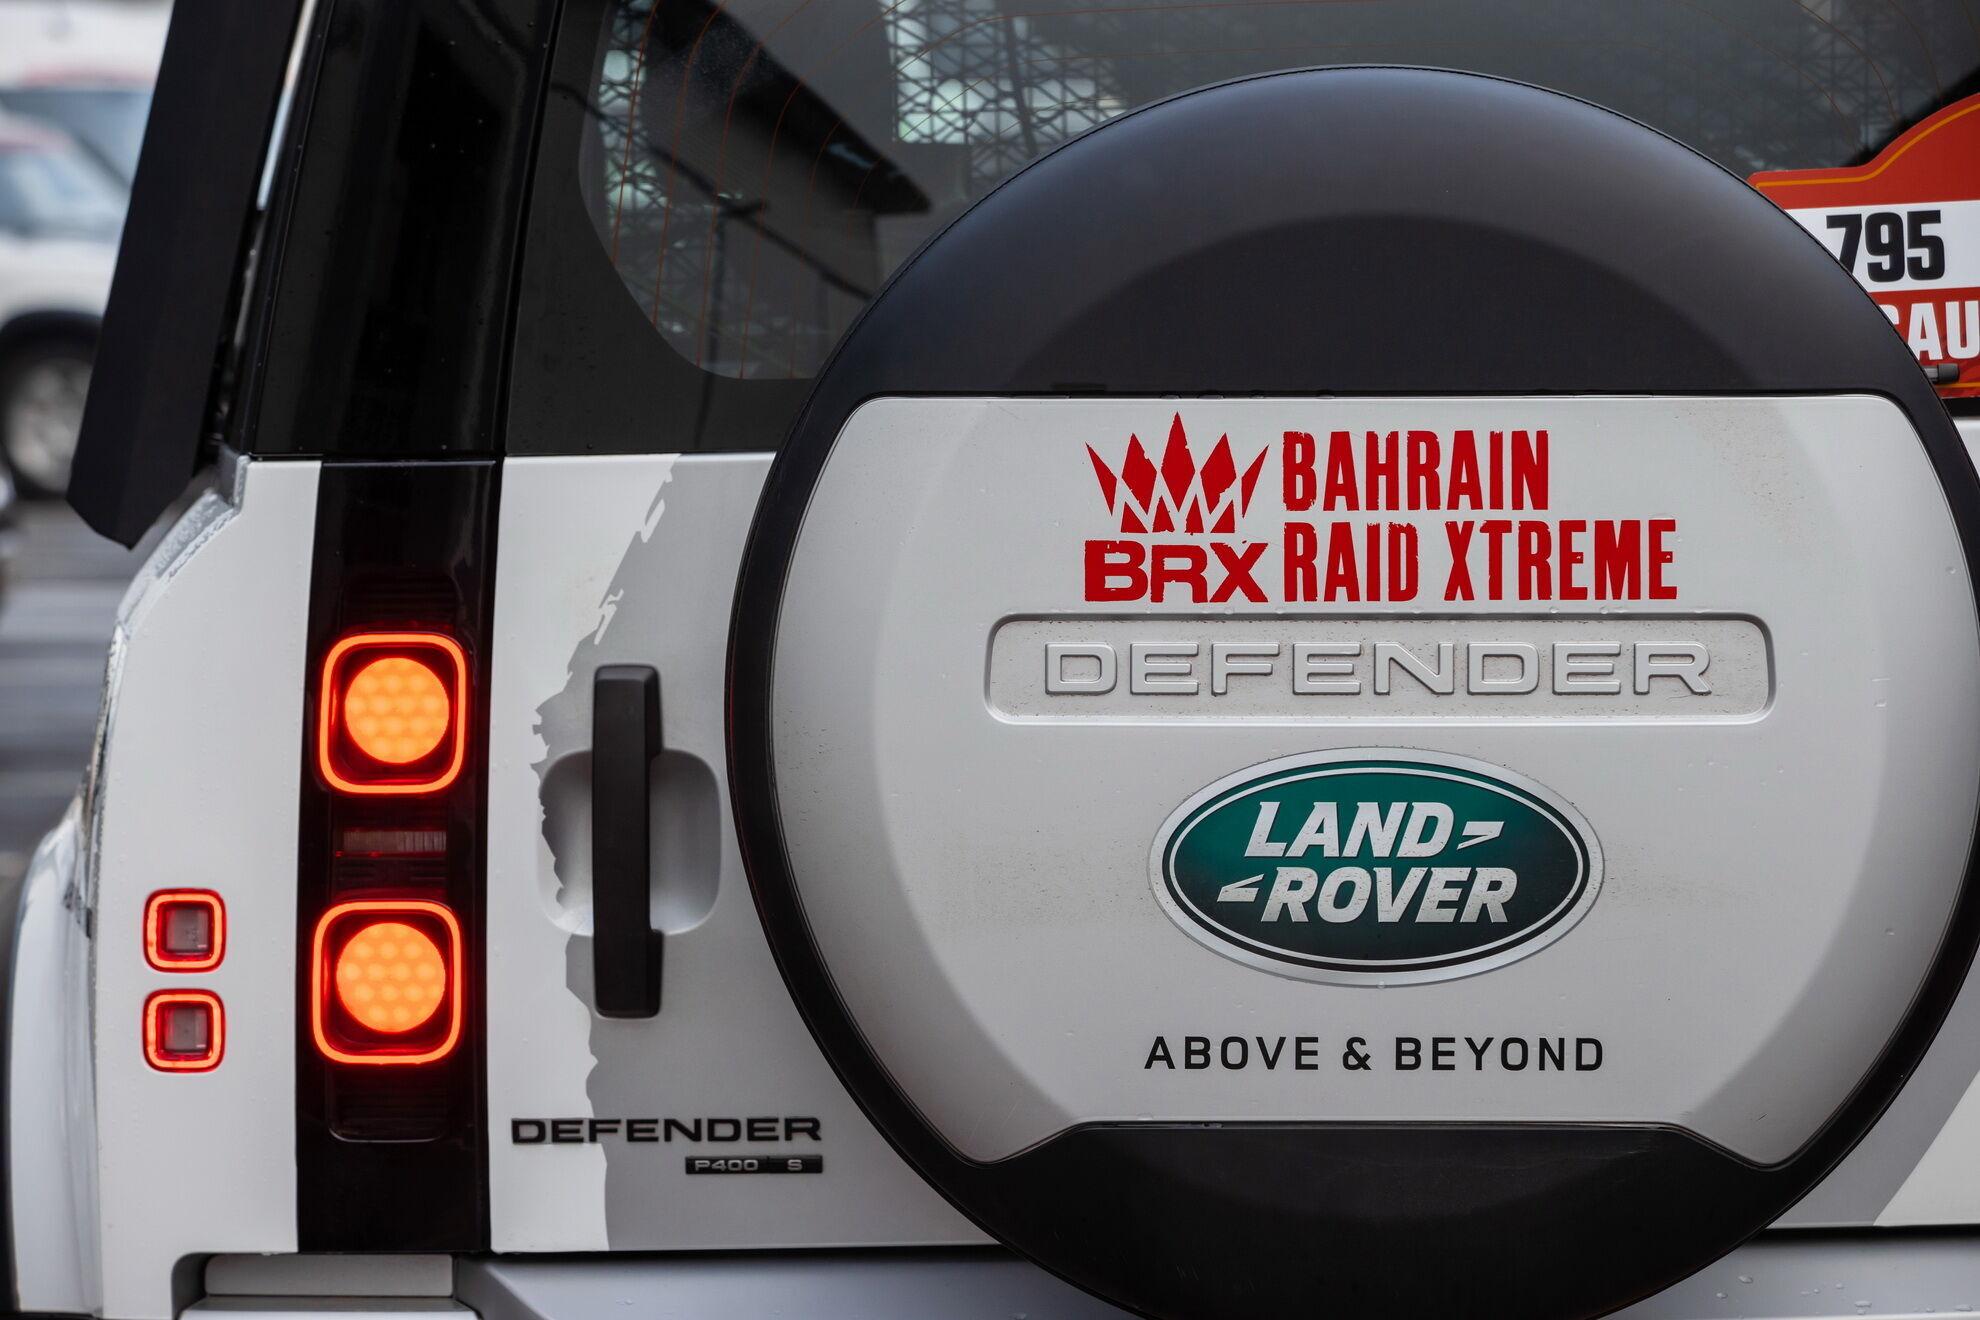 Land Rover Defender 110 P400 для поддержки команды BRX